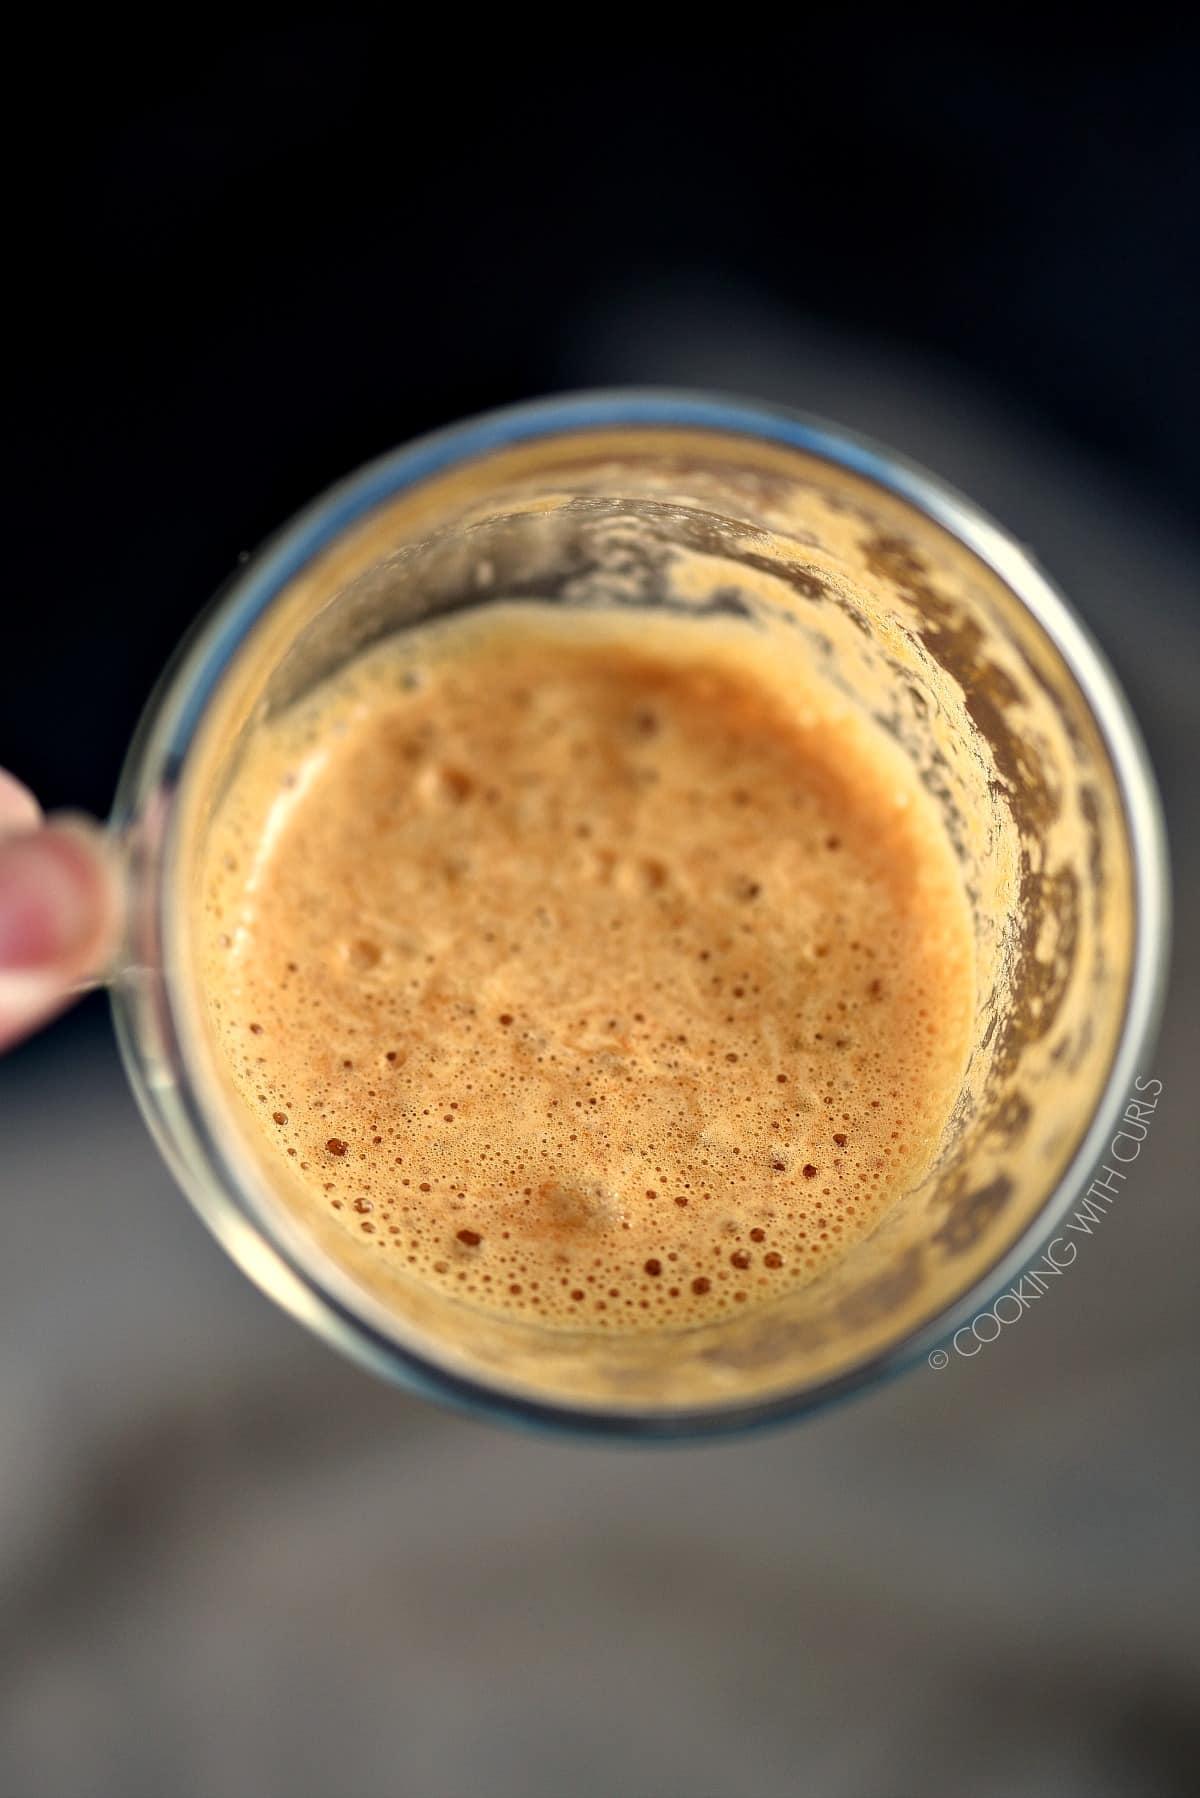 Creamy foam that tops a Whipped Dalgona Coffee.